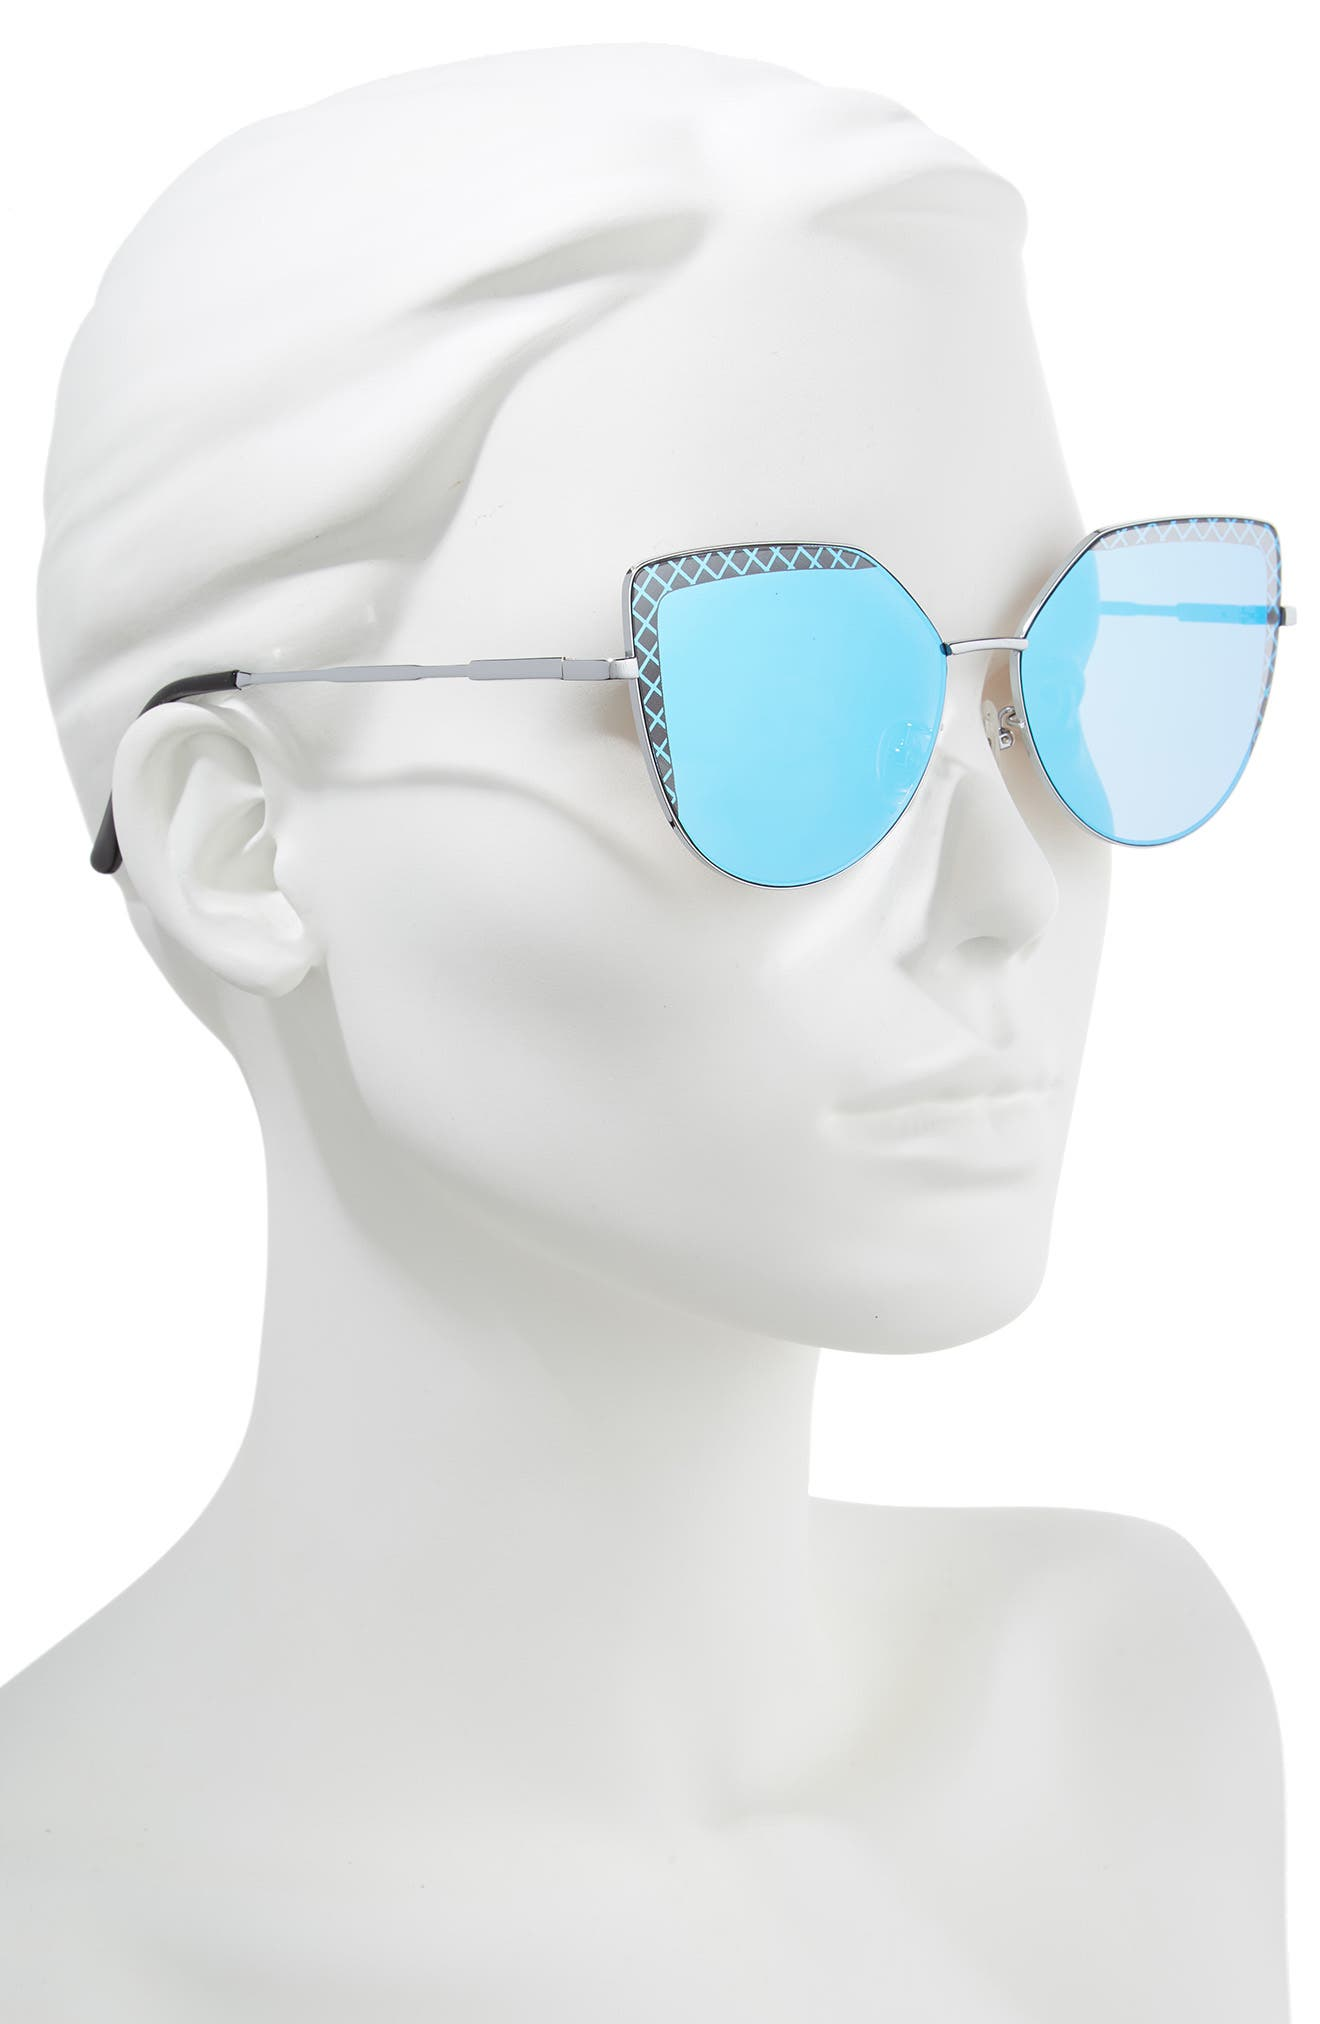 60mm Textured Lens Cat Eye Sunglasses,                             Alternate thumbnail 2, color,                             Silver/ Blue